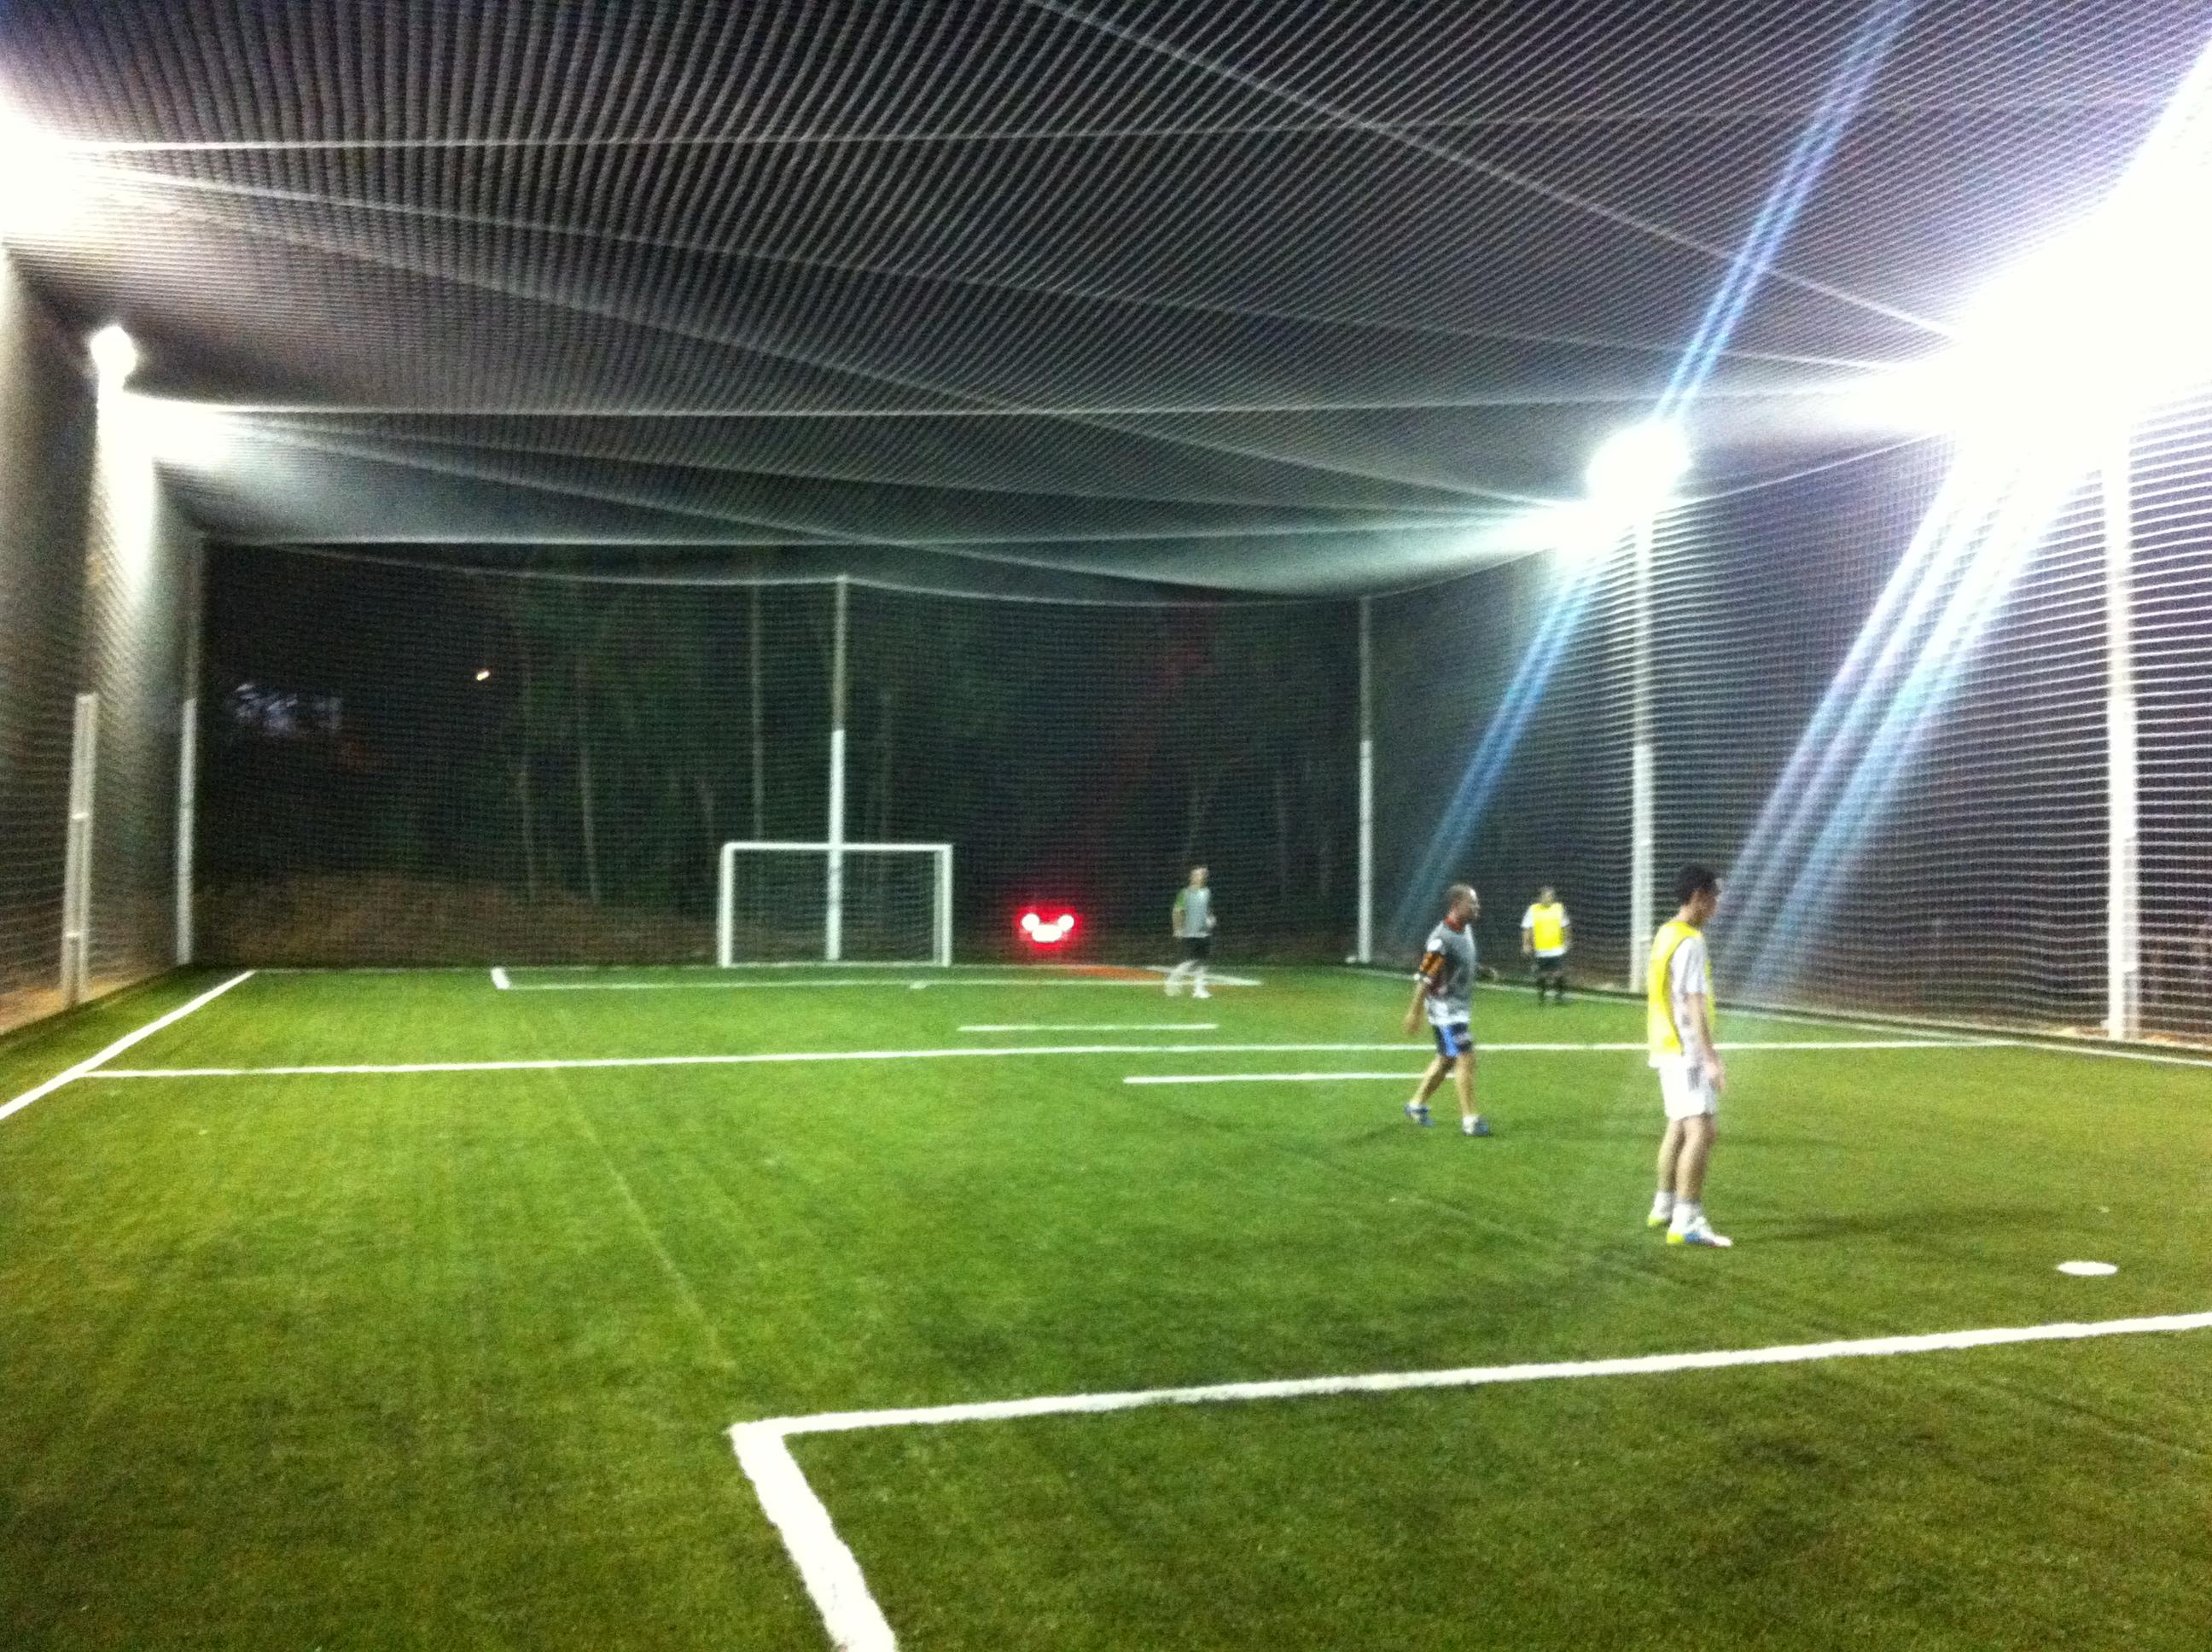 Soccer Country Bar - Quadra de grama sintética - Blumenau / Santa Catarina